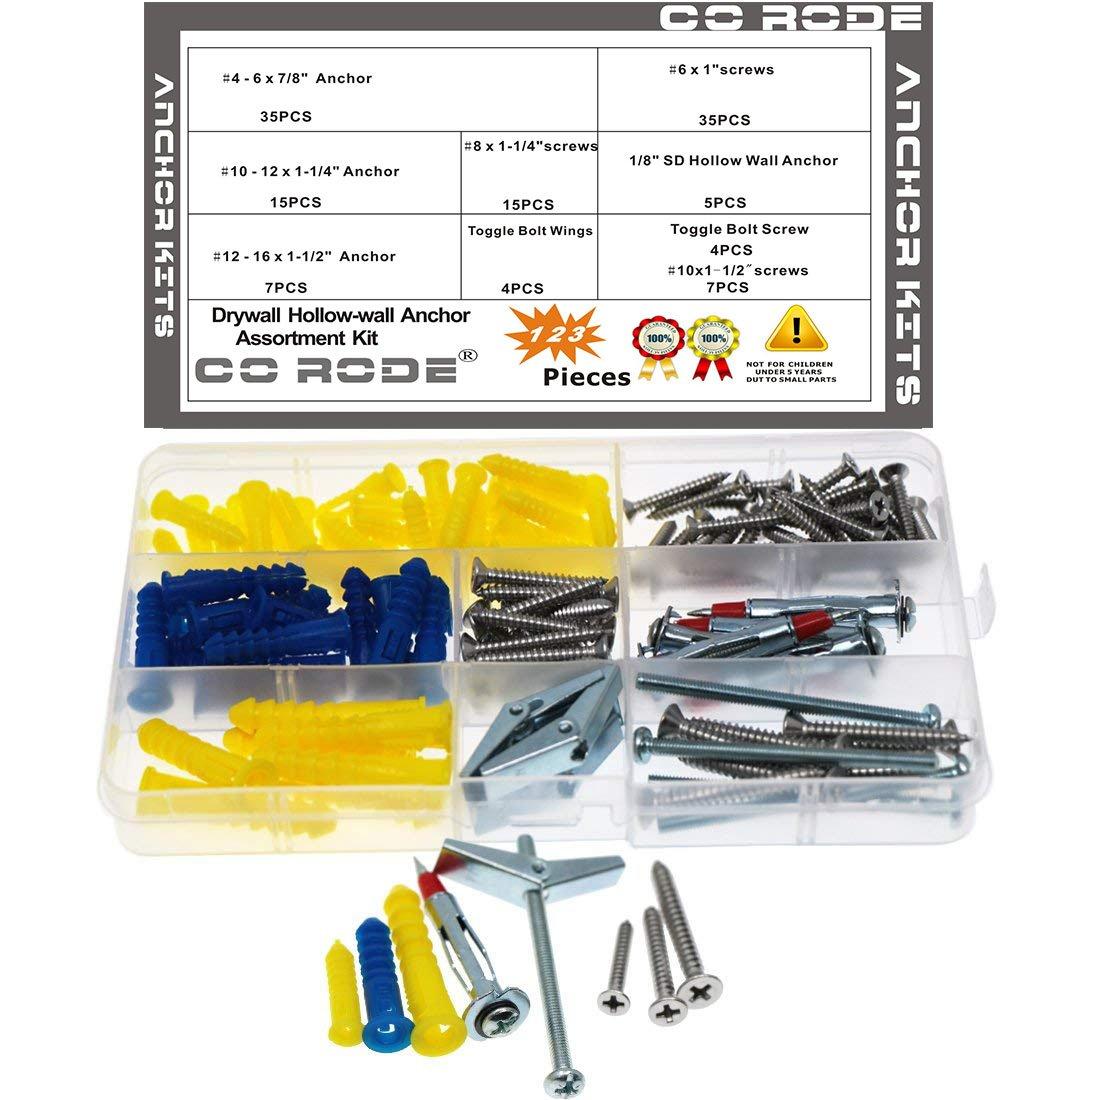 Drywall Anchors, CO RODE 123PCS Drywall Screws Self Drilling Hollow-Wall Anchor Molly Bolt Toggle Bolts Kit